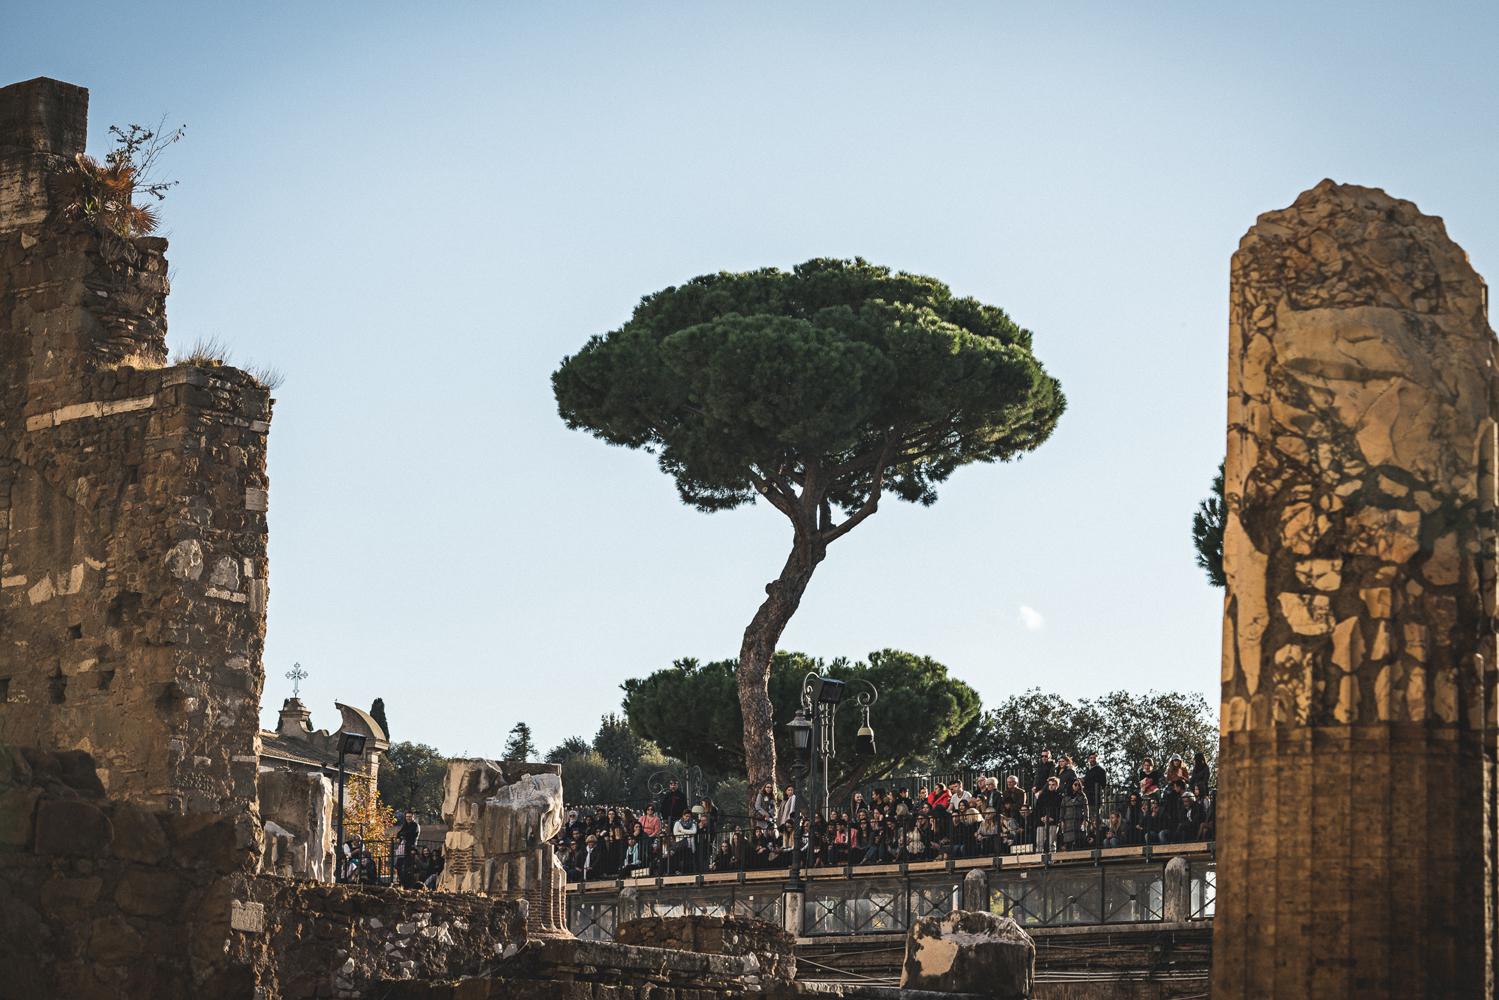 Photo by www.vittoriolafata.it